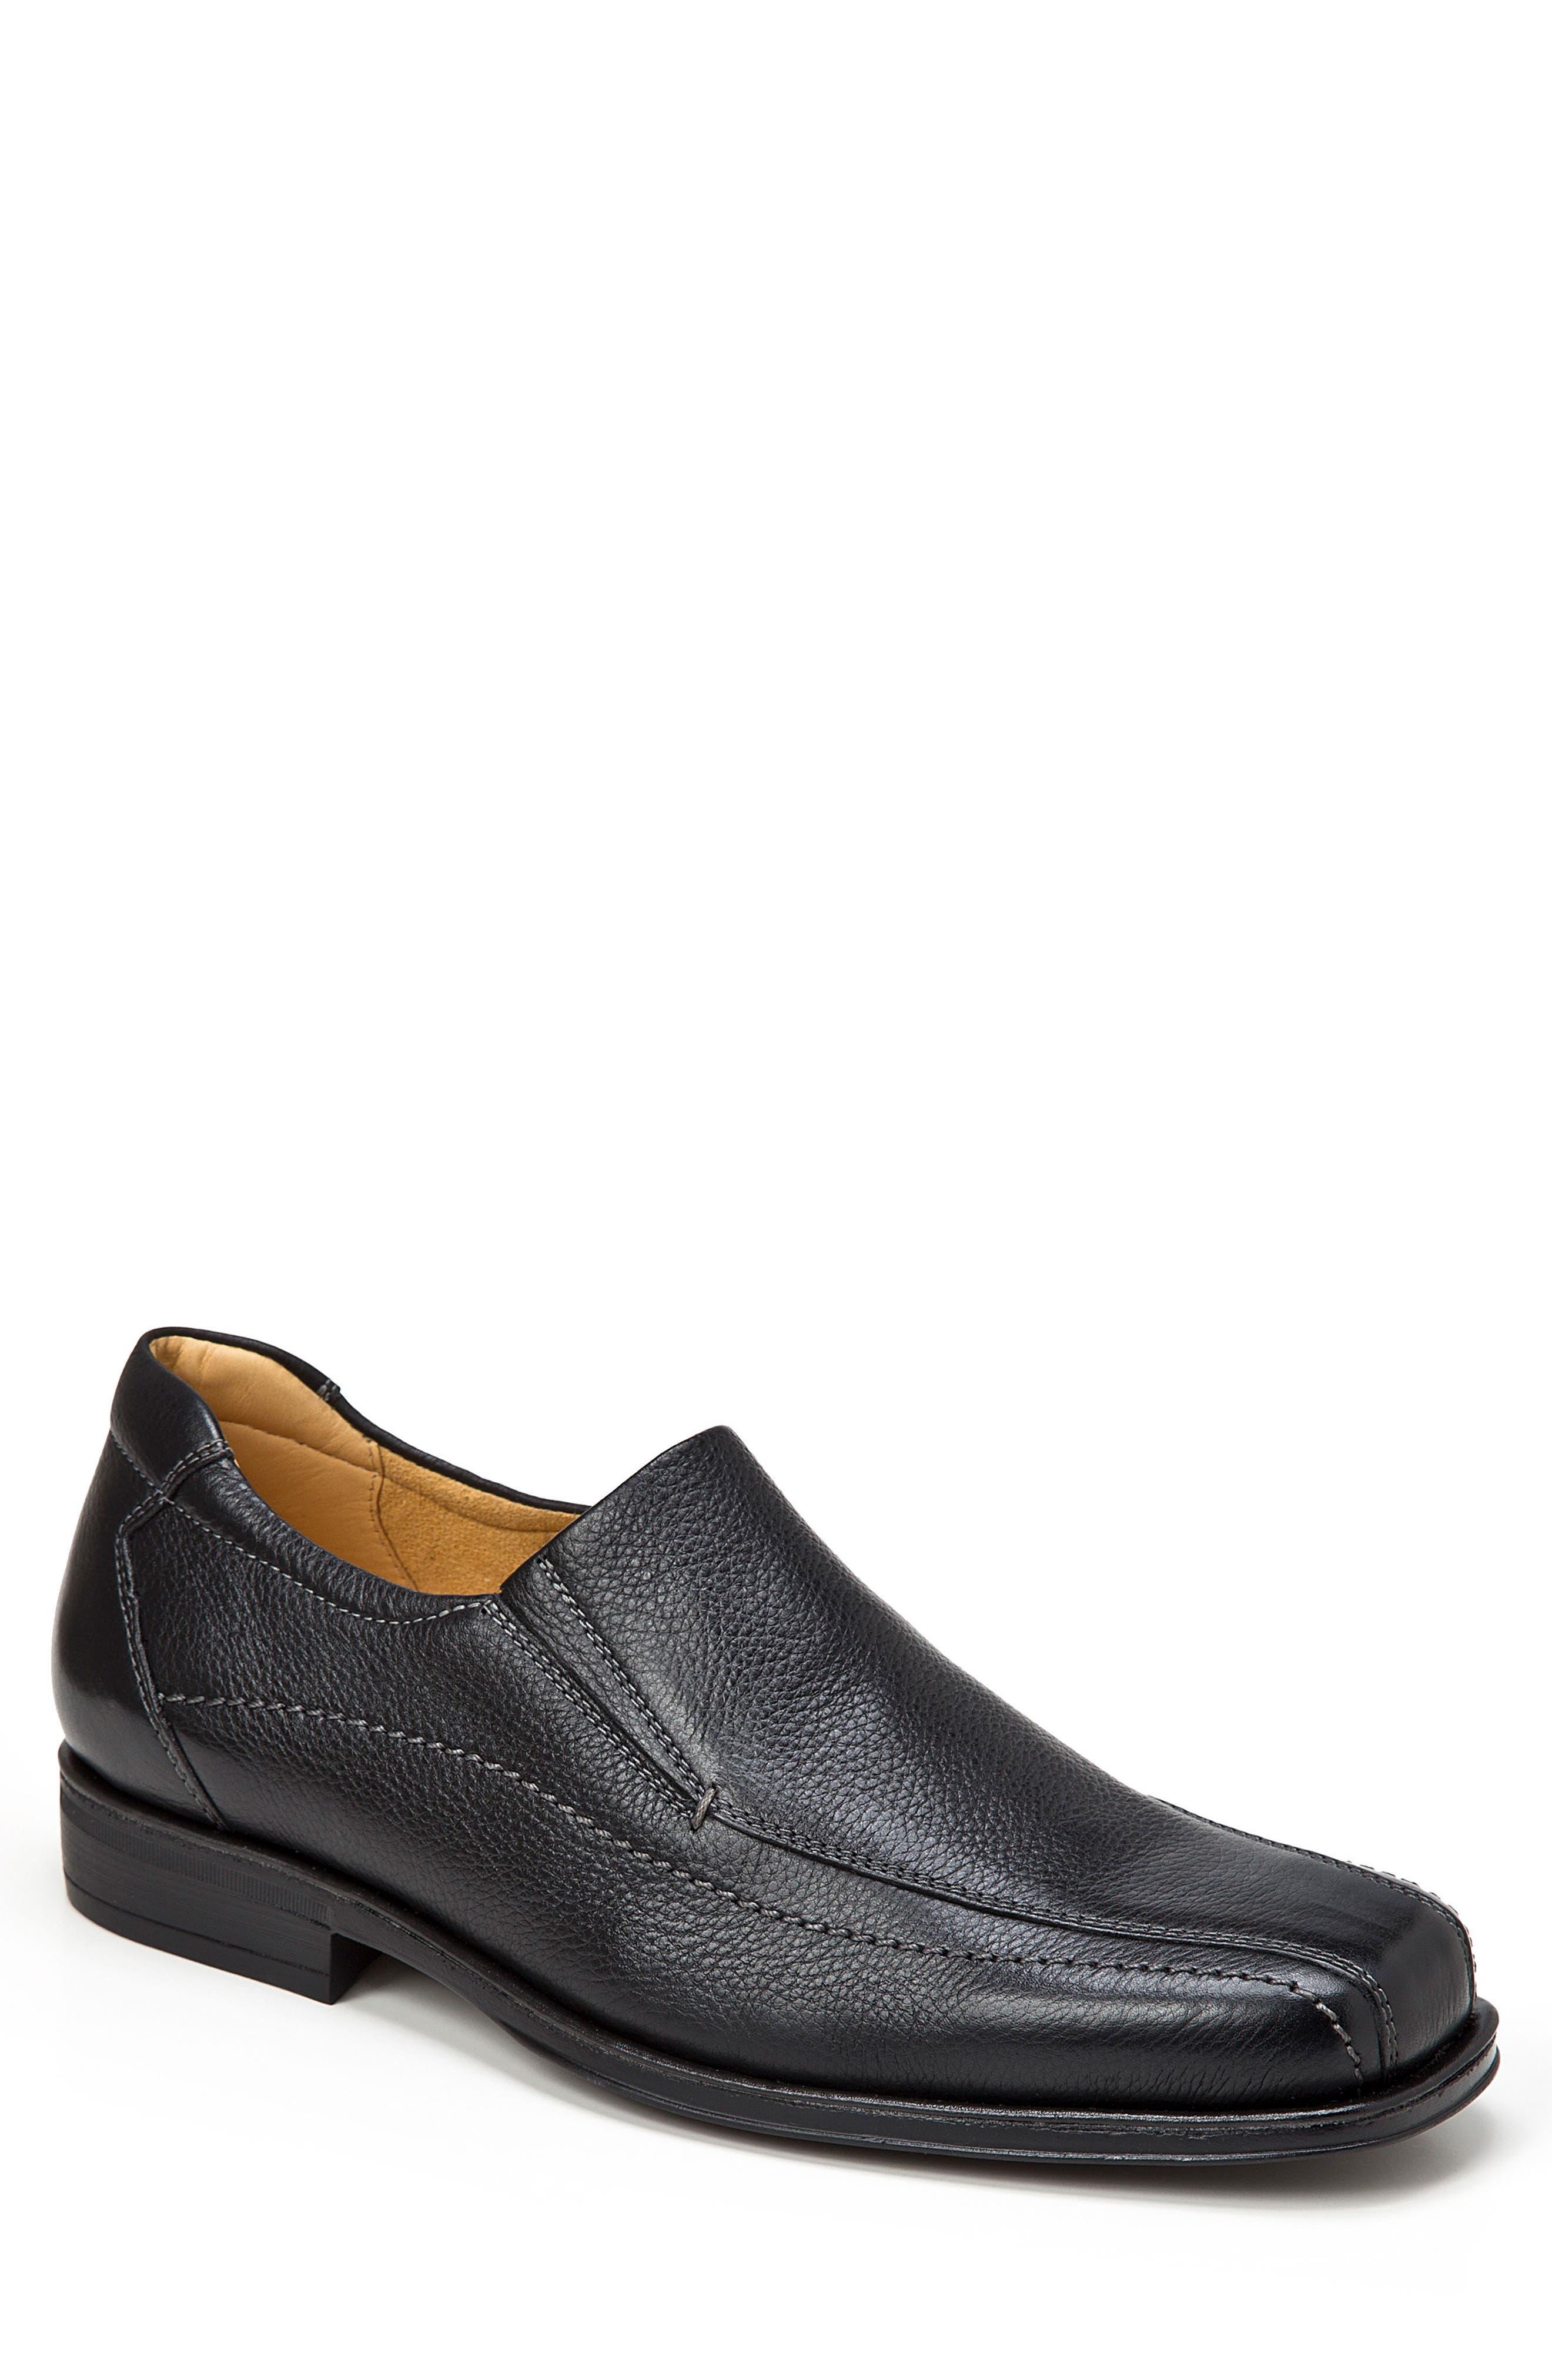 Elgin Venetian Loafer,                         Main,                         color, Black